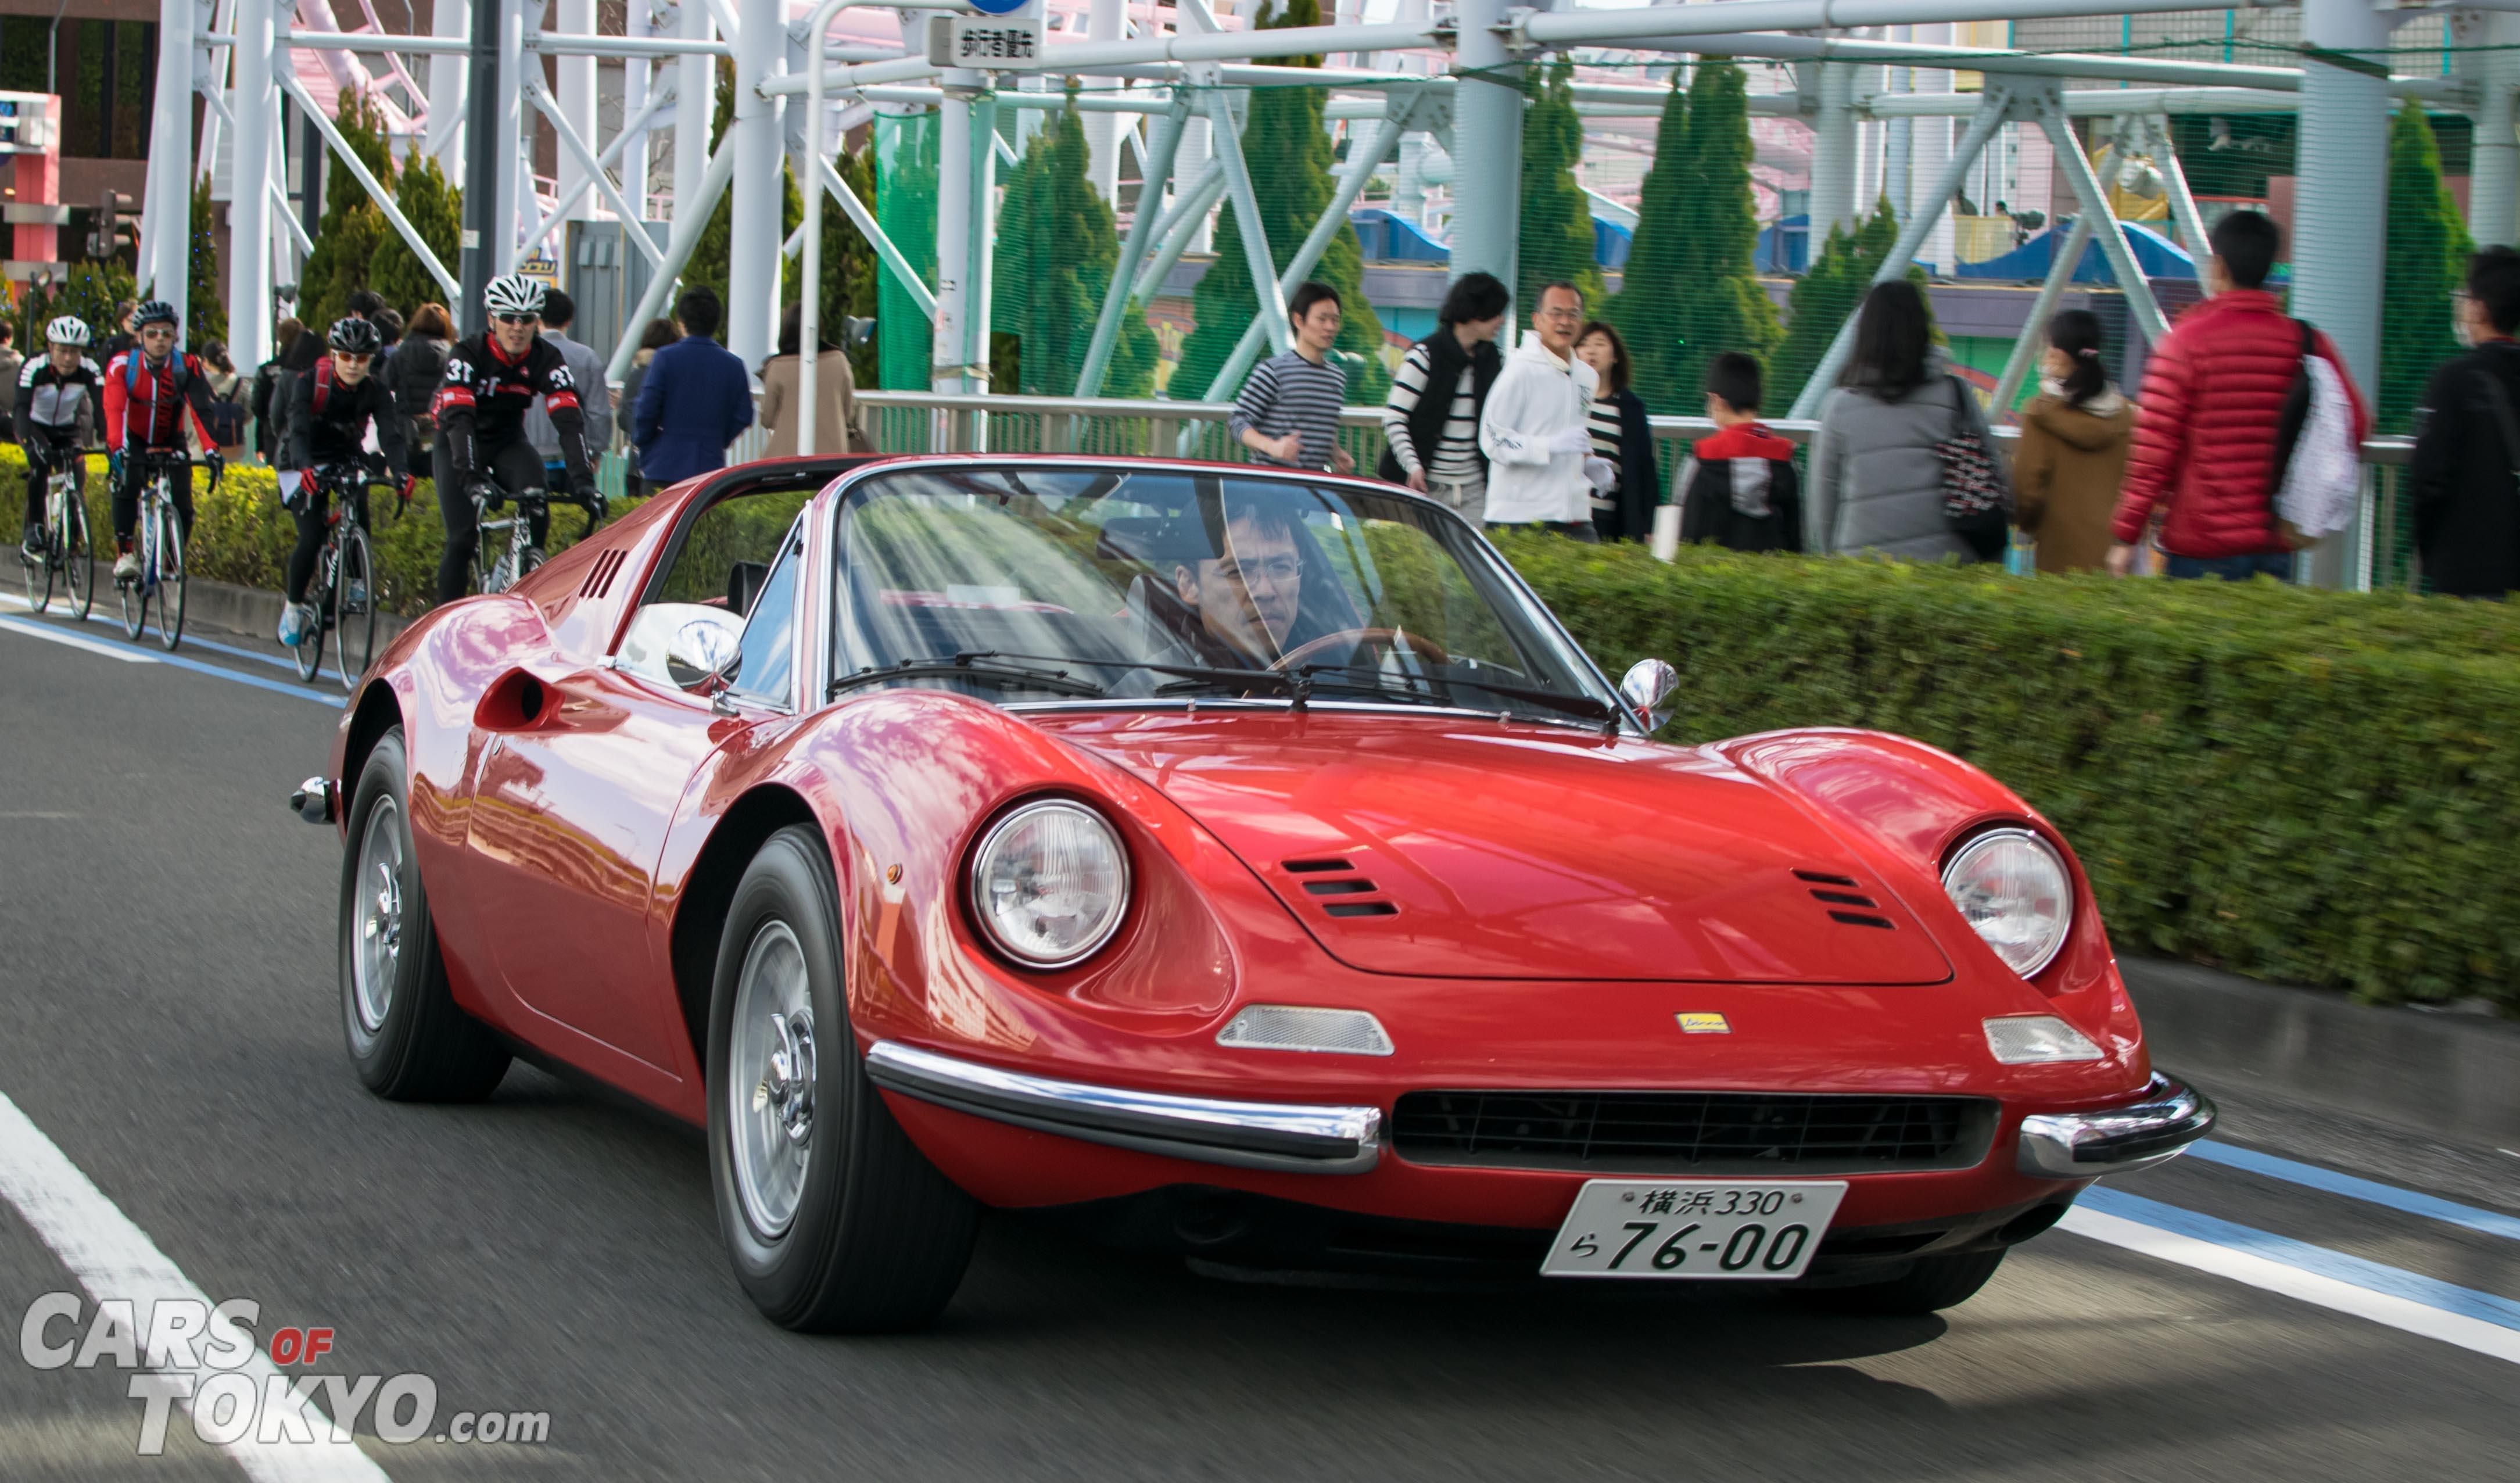 Cars of Tokyo Classic Ferrari 246 GTS